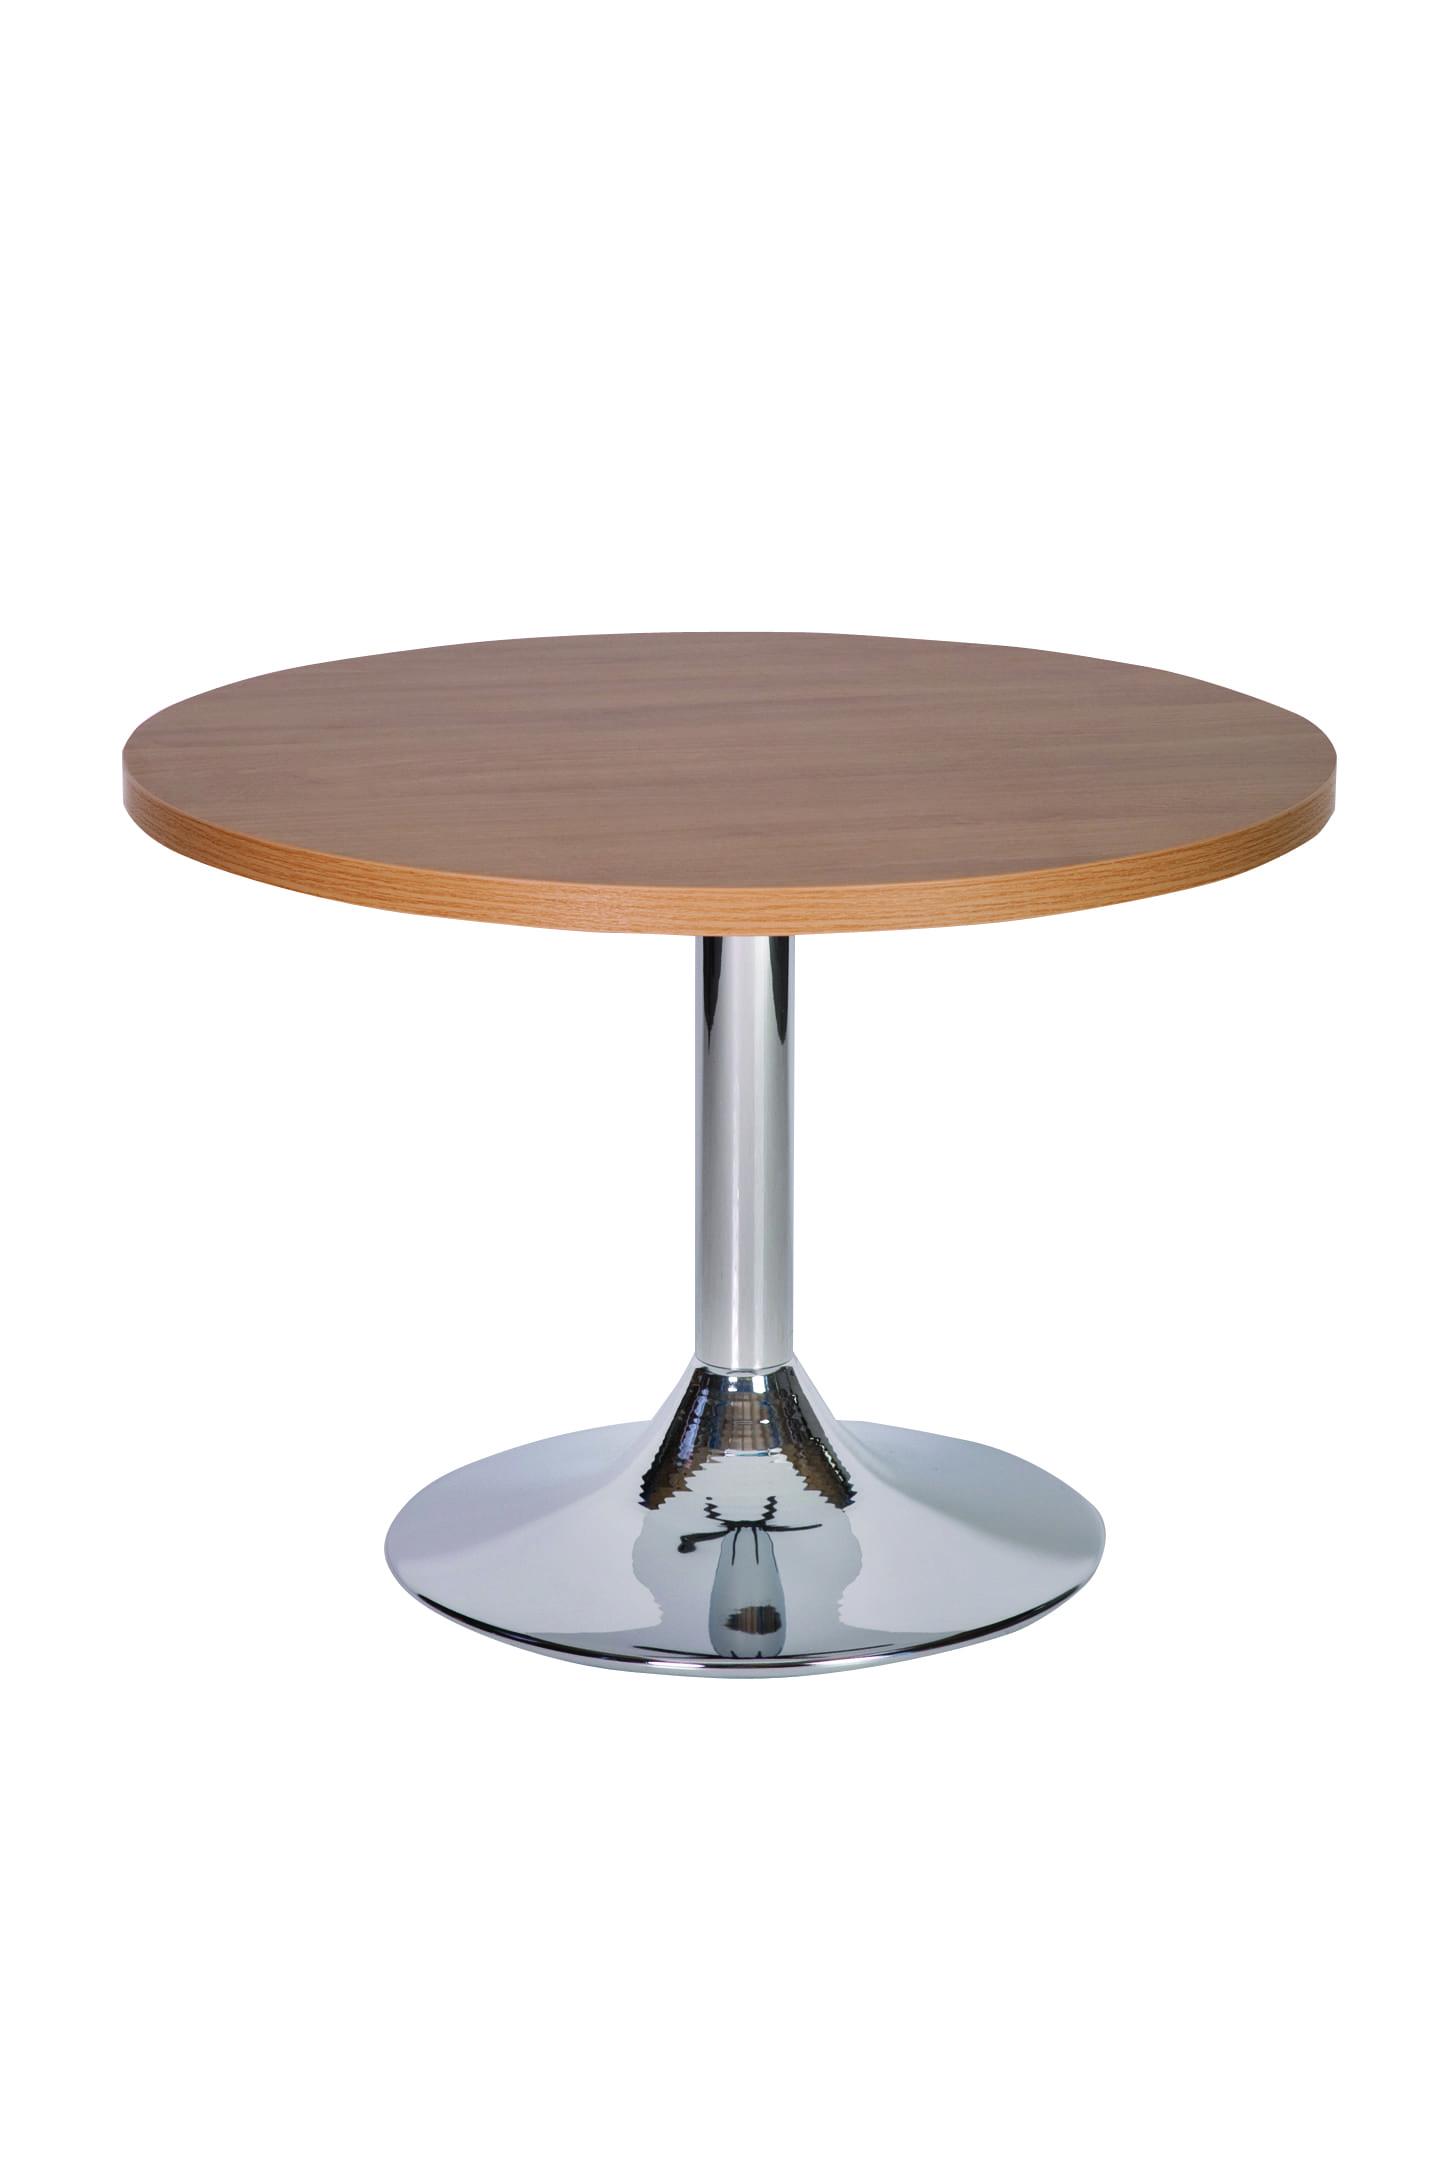 Large Ramizon Round Chrome Table With Laminate Tops - Coffee